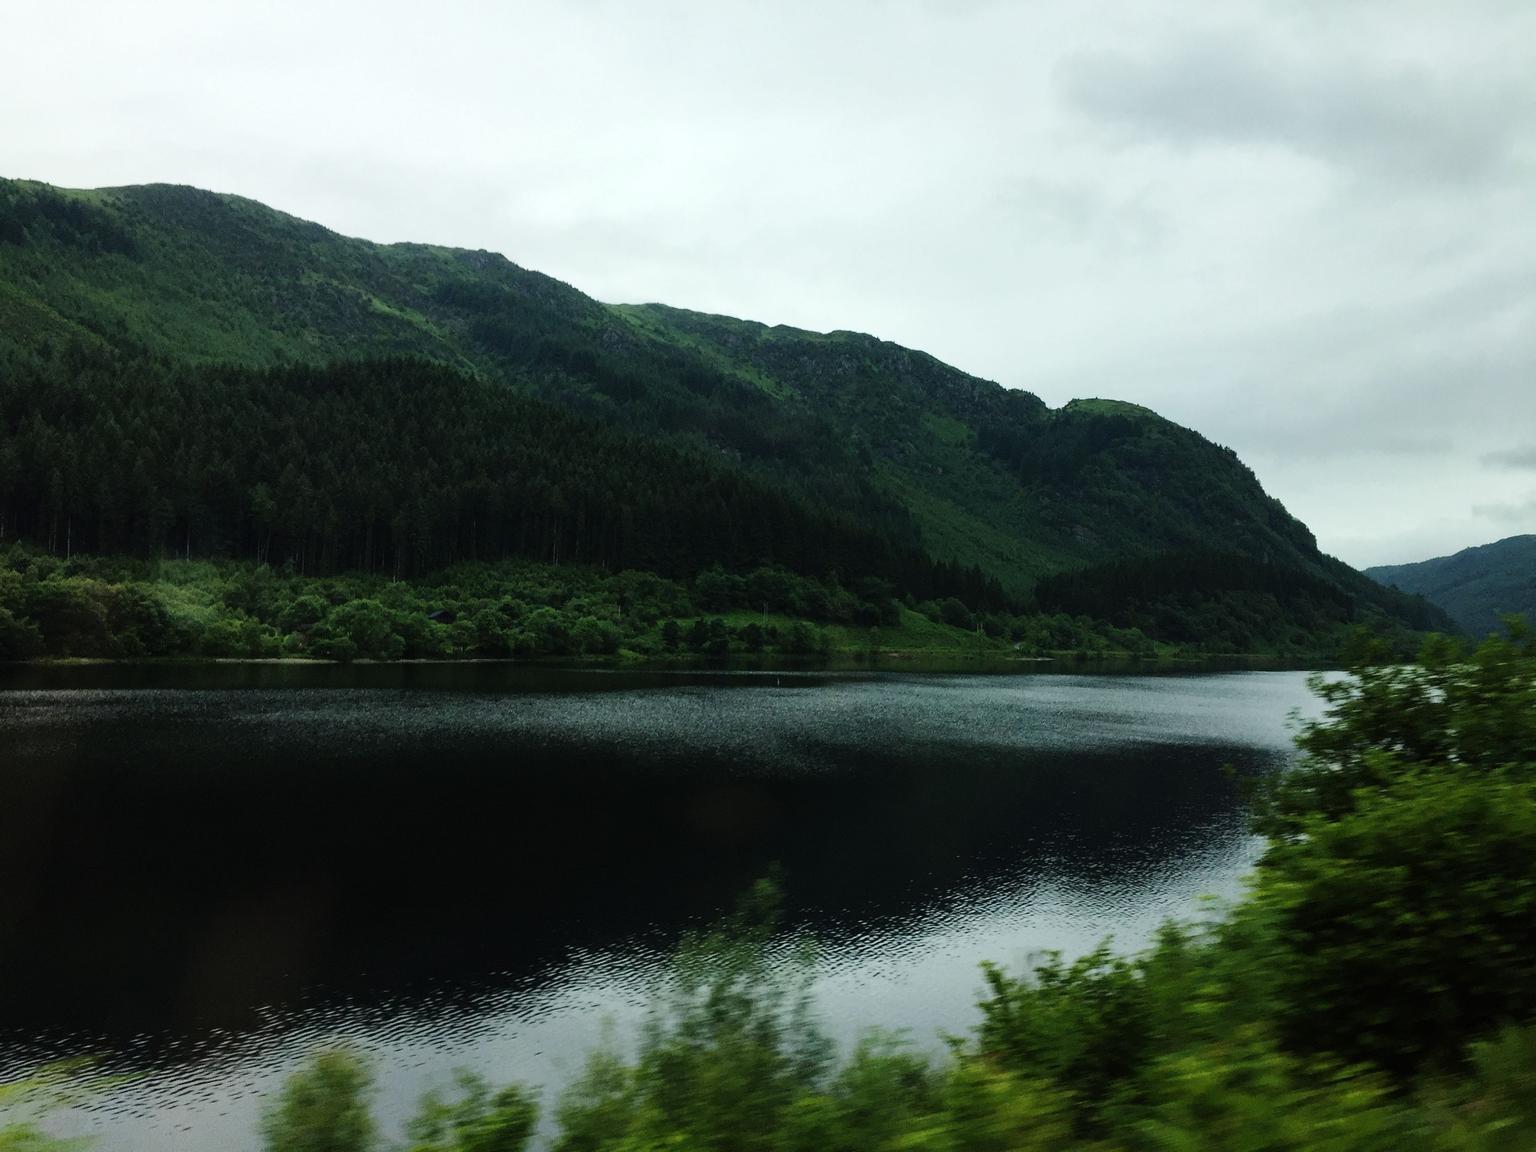 MÁS FOTOS, Glencoe, Ben Nevis and Loch Ness Day Tour from Edinburgh